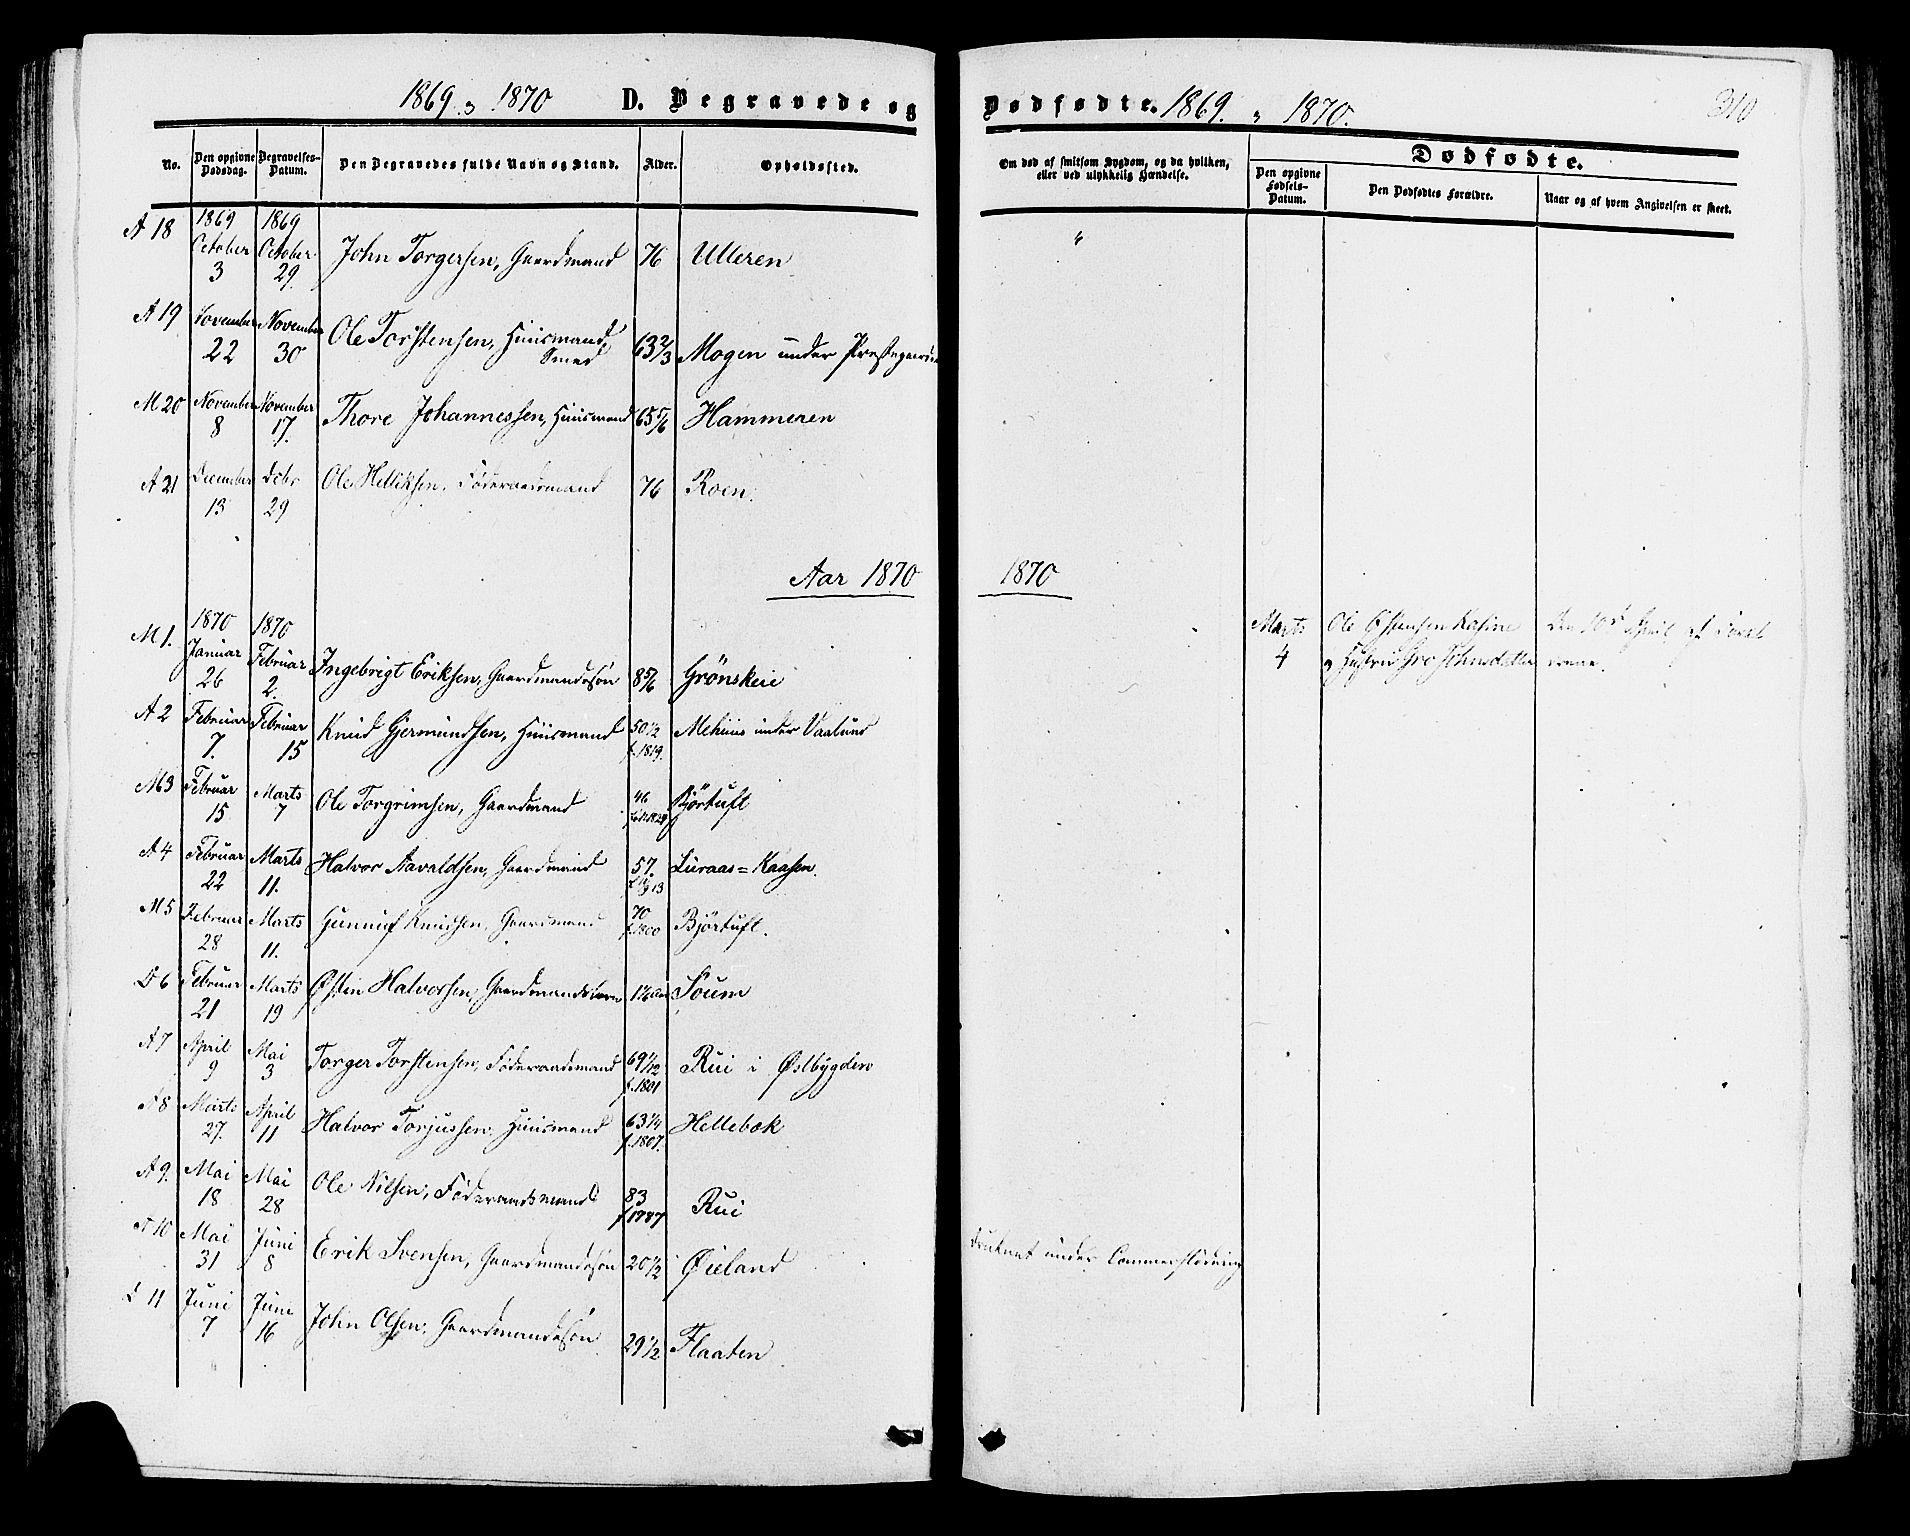 SAKO, Tinn kirkebøker, F/Fa/L0006: Ministerialbok nr. I 6, 1857-1878, s. 310